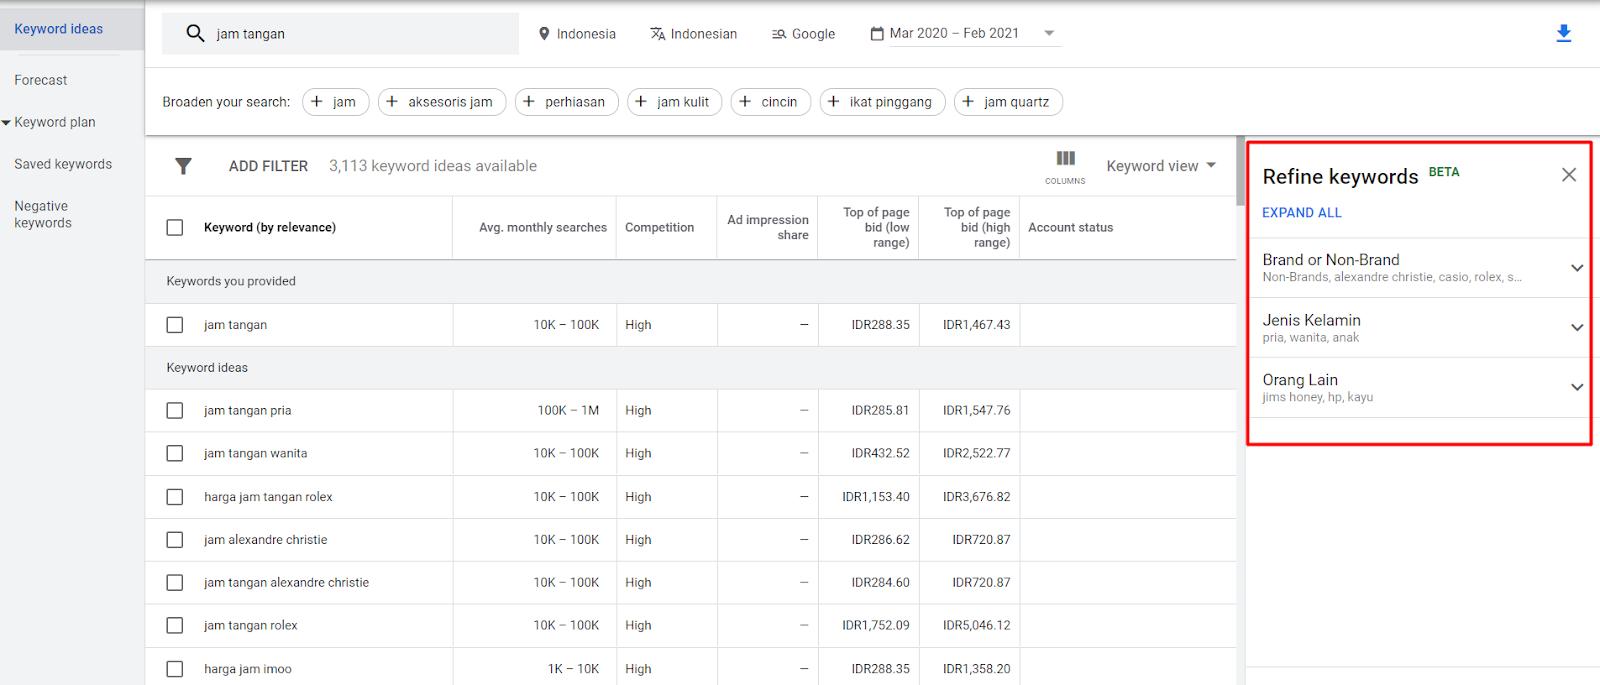 Fitur Google Keyword Planner bernama Refine Keyword